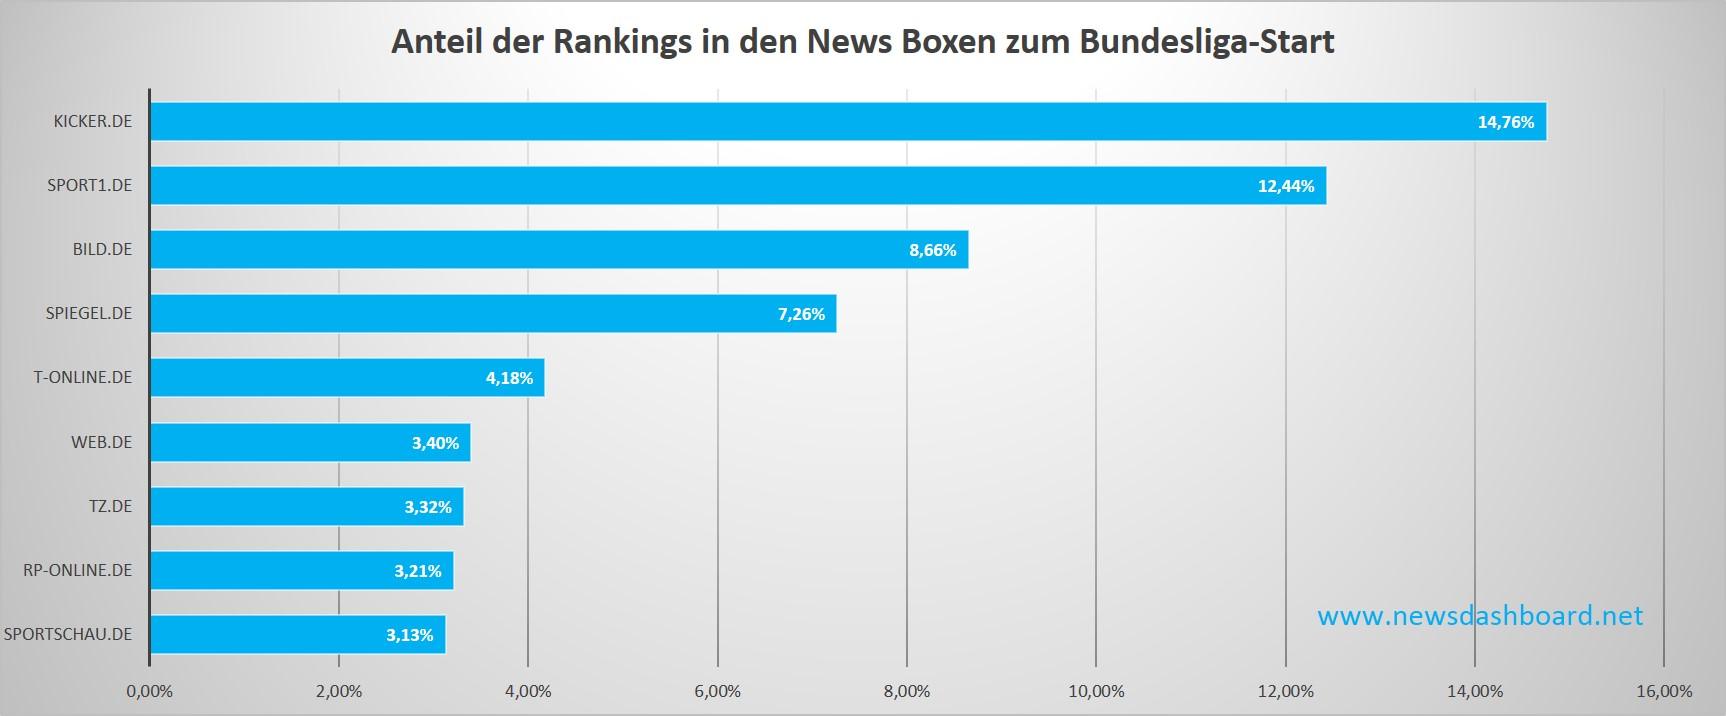 Google News Boxen Bundesliga Keywordset 1. Spieltag Saison 2015/16